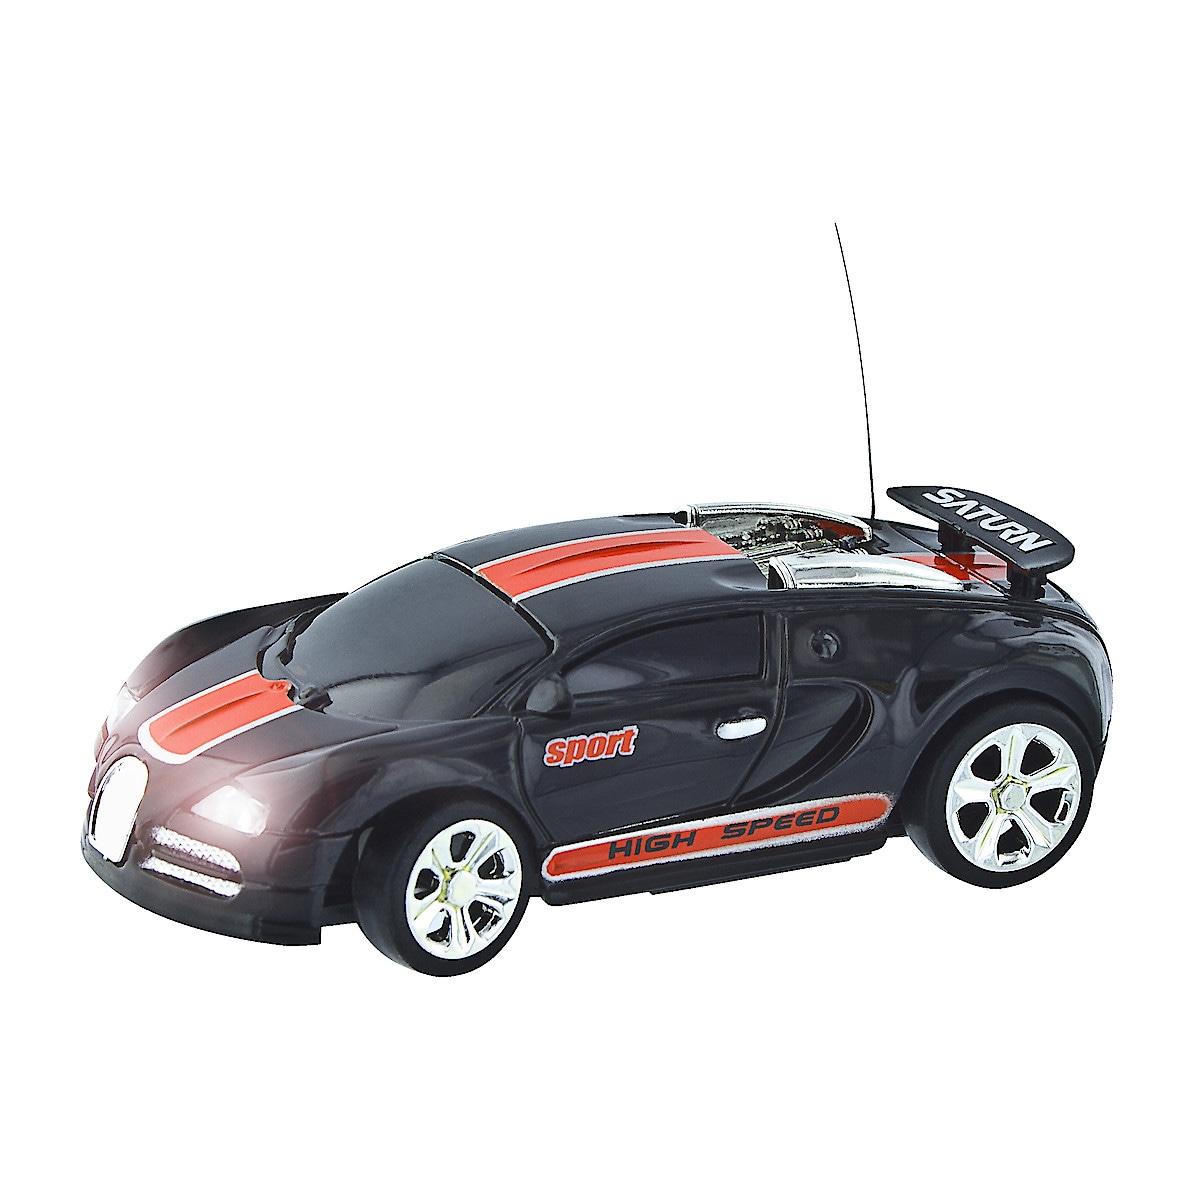 Topraiders Microcar